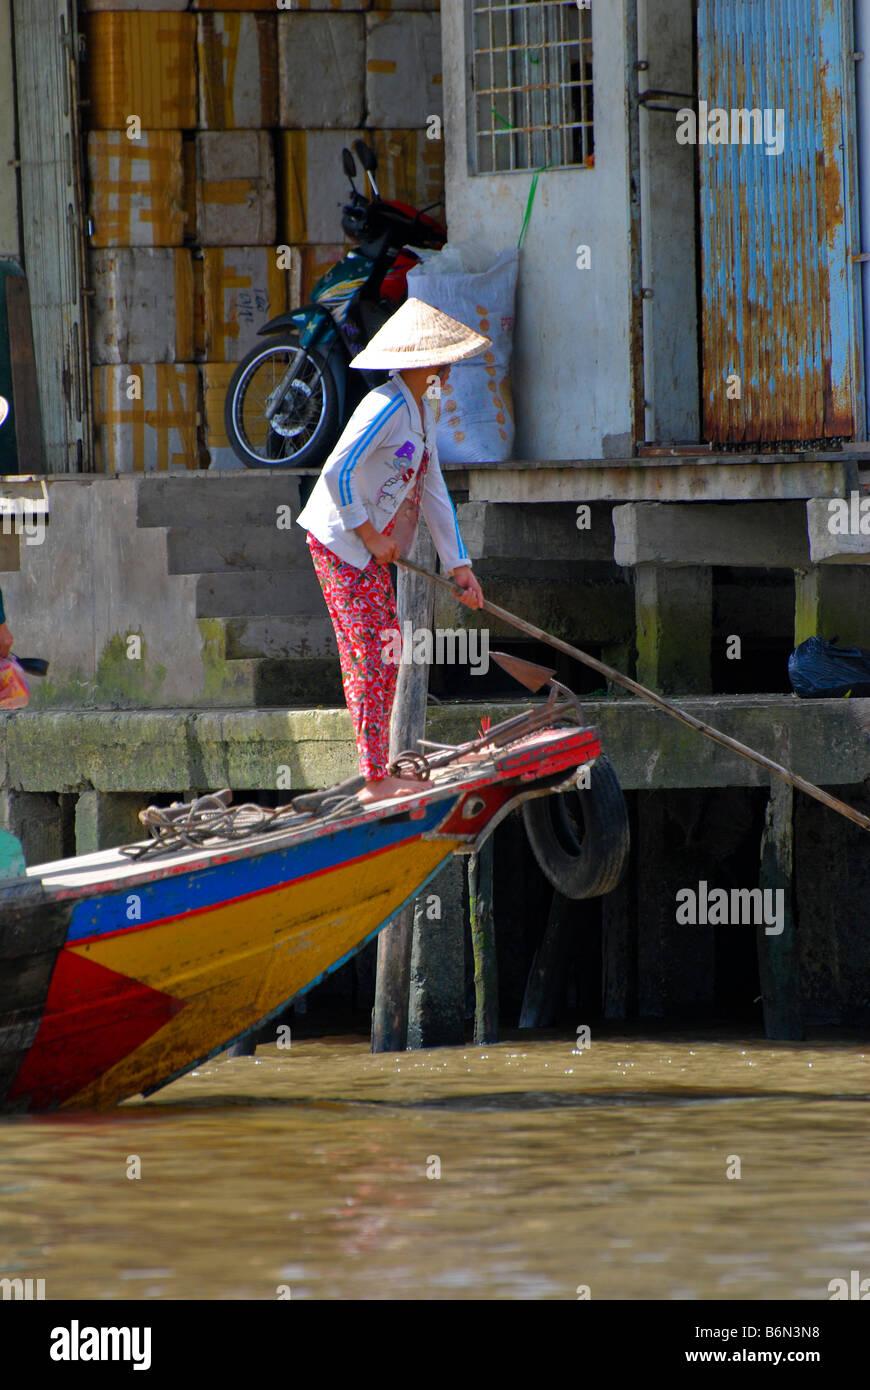 Vietnamese boatwoman skulling from sampan, town of Cai Be, Mekong Delta, Vietnam - Stock Image